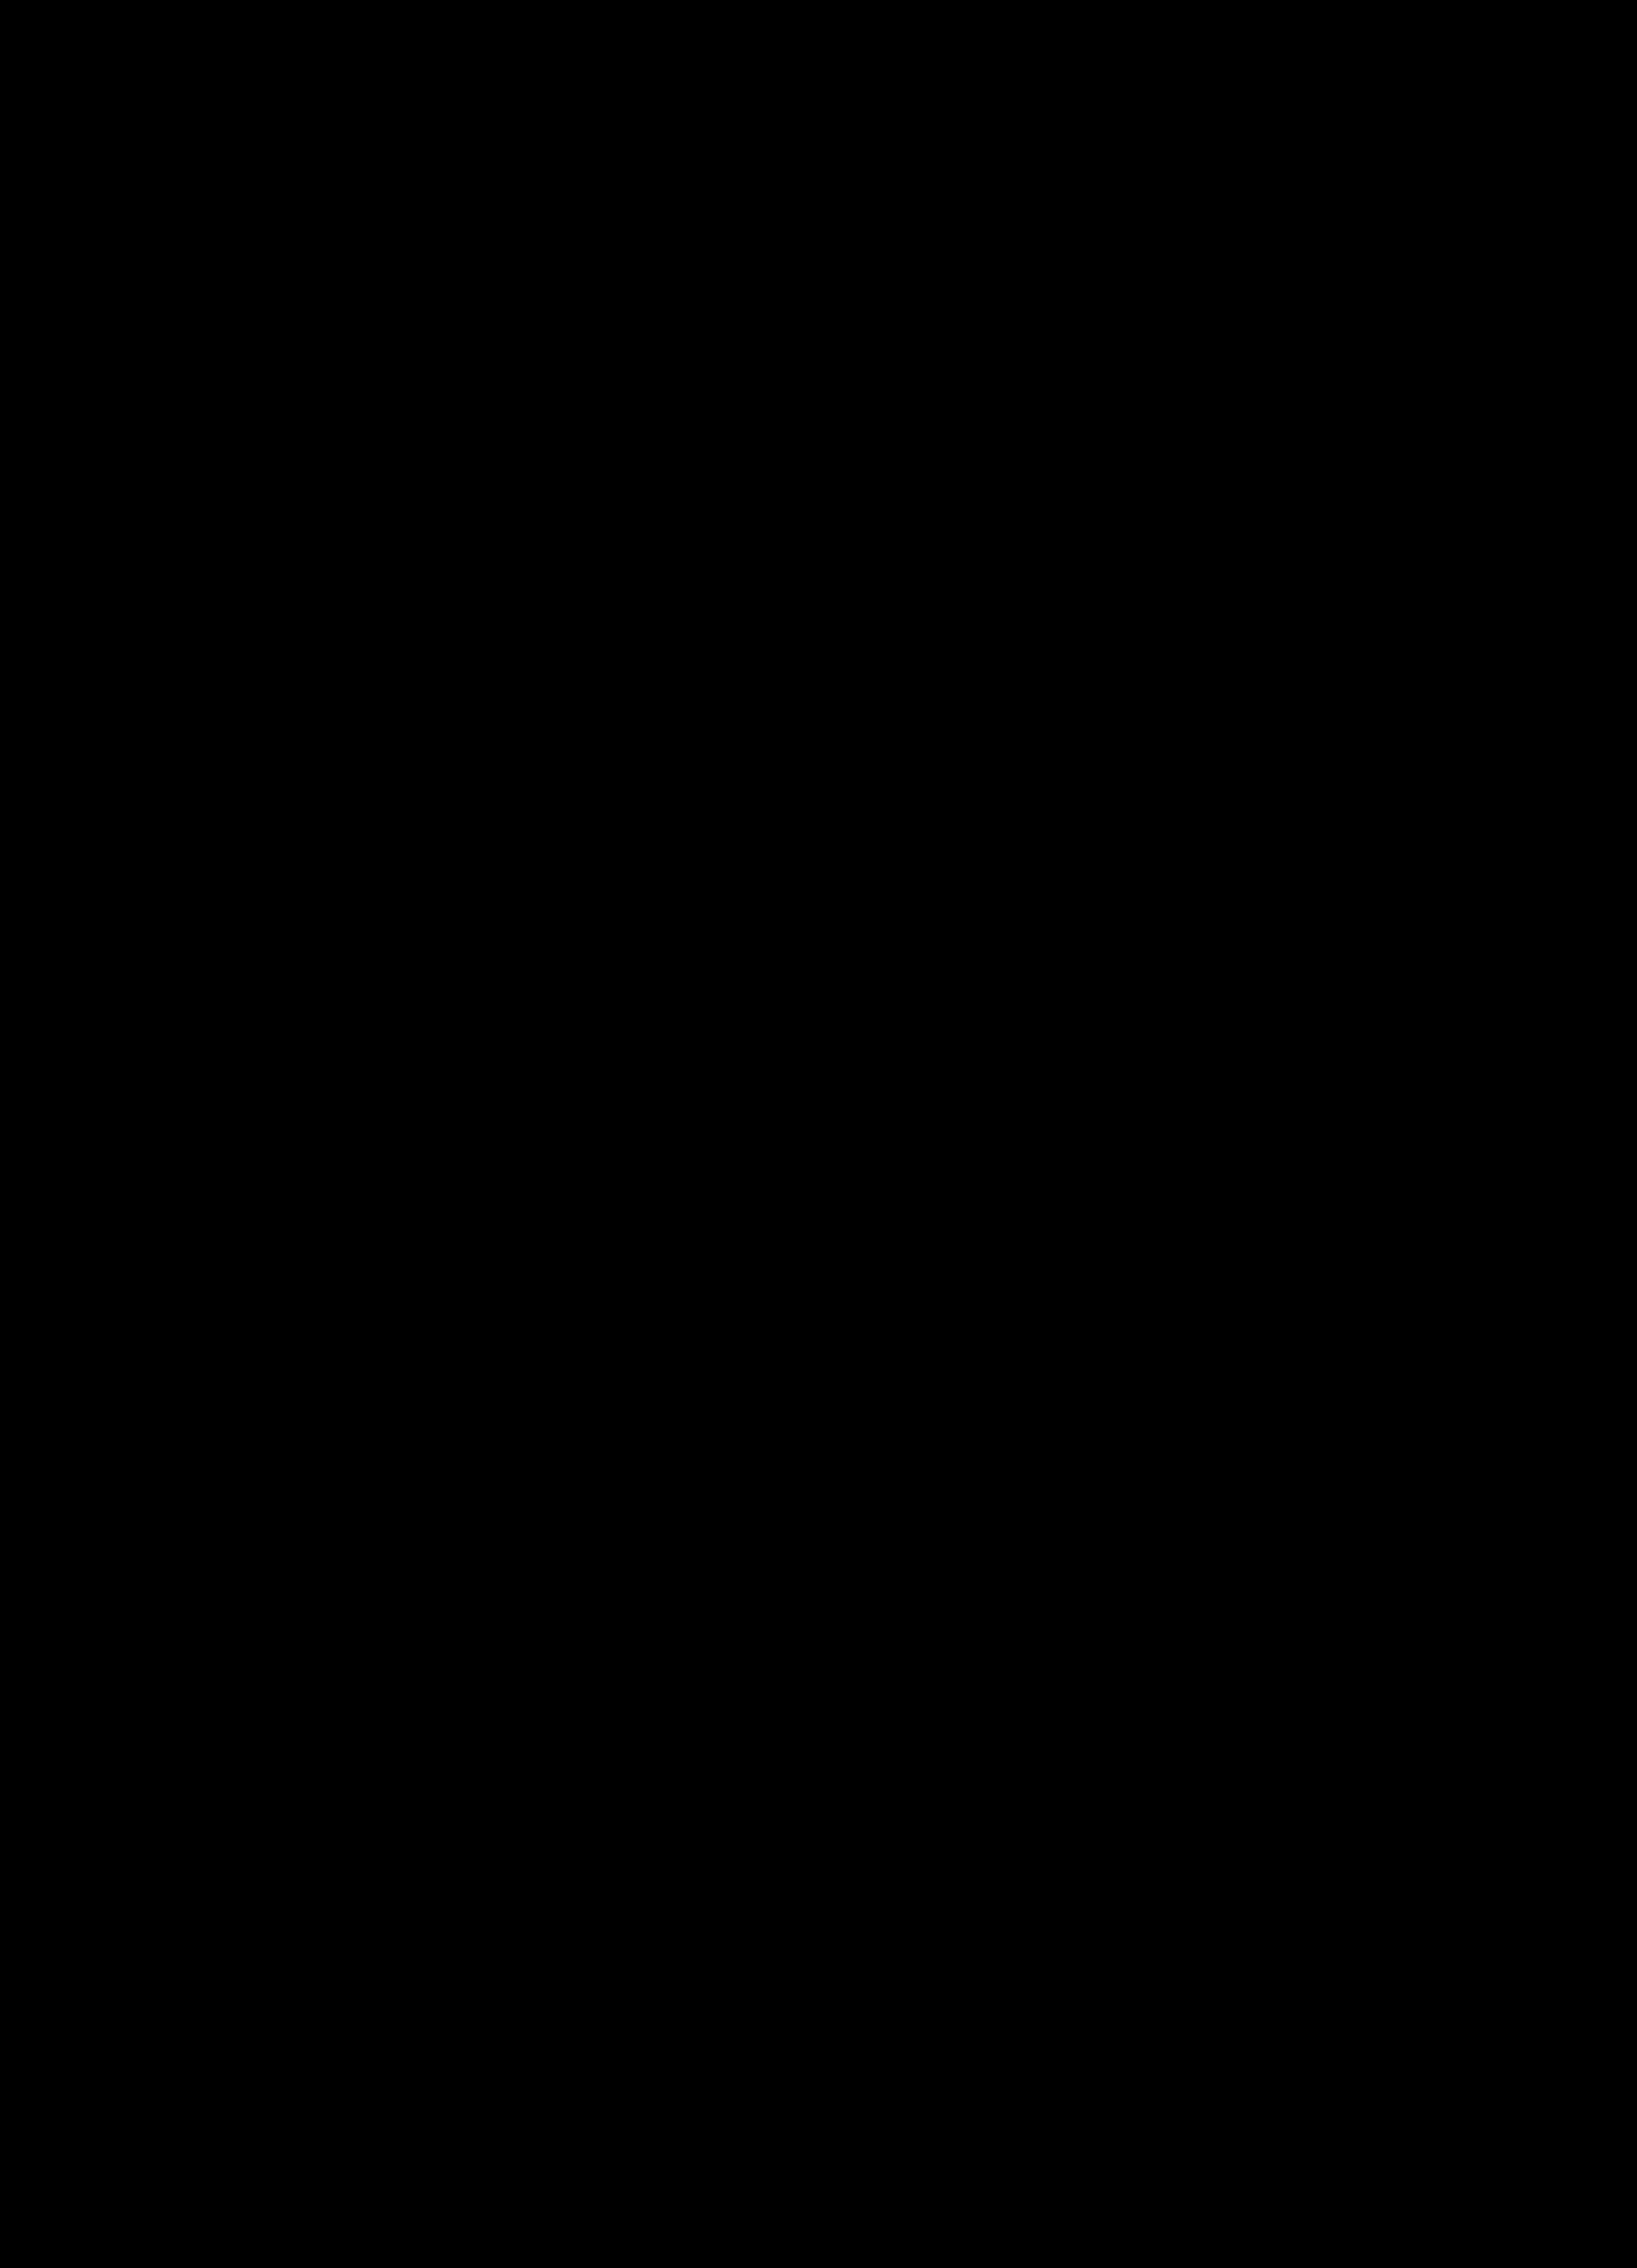 Black fist logo